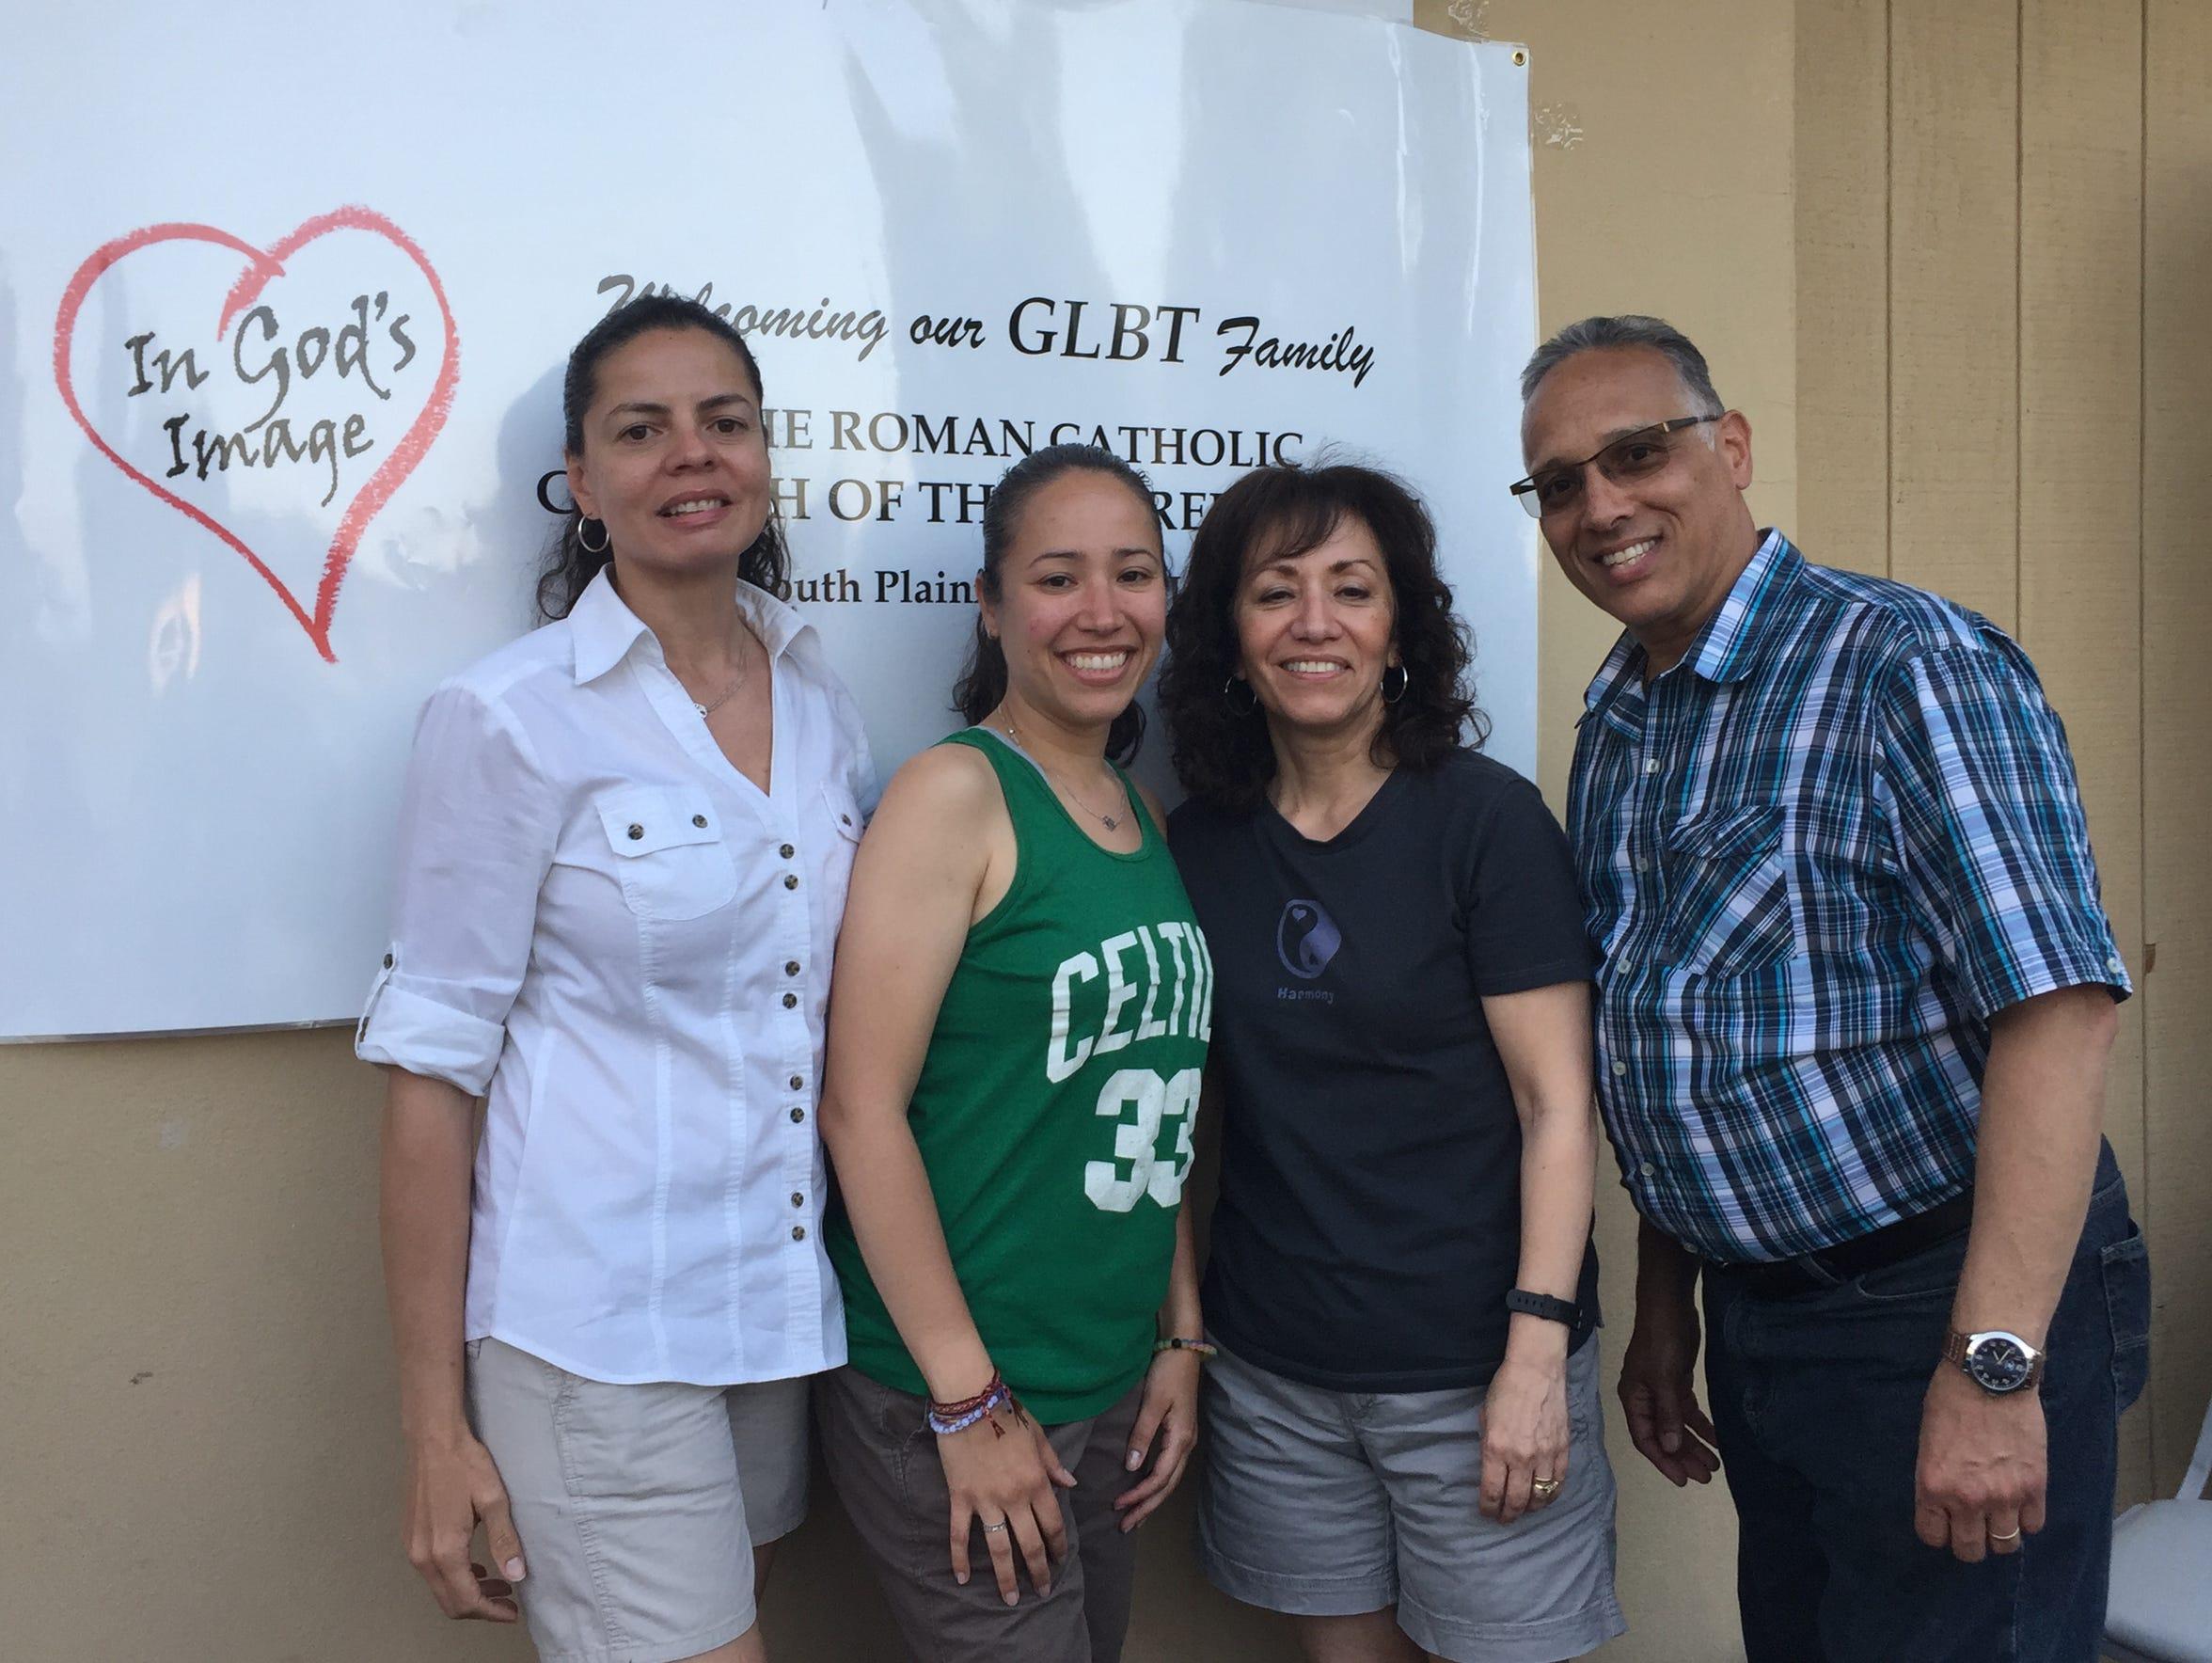 On July 14, Lorrie Garcia of Union City, Eva, Nora